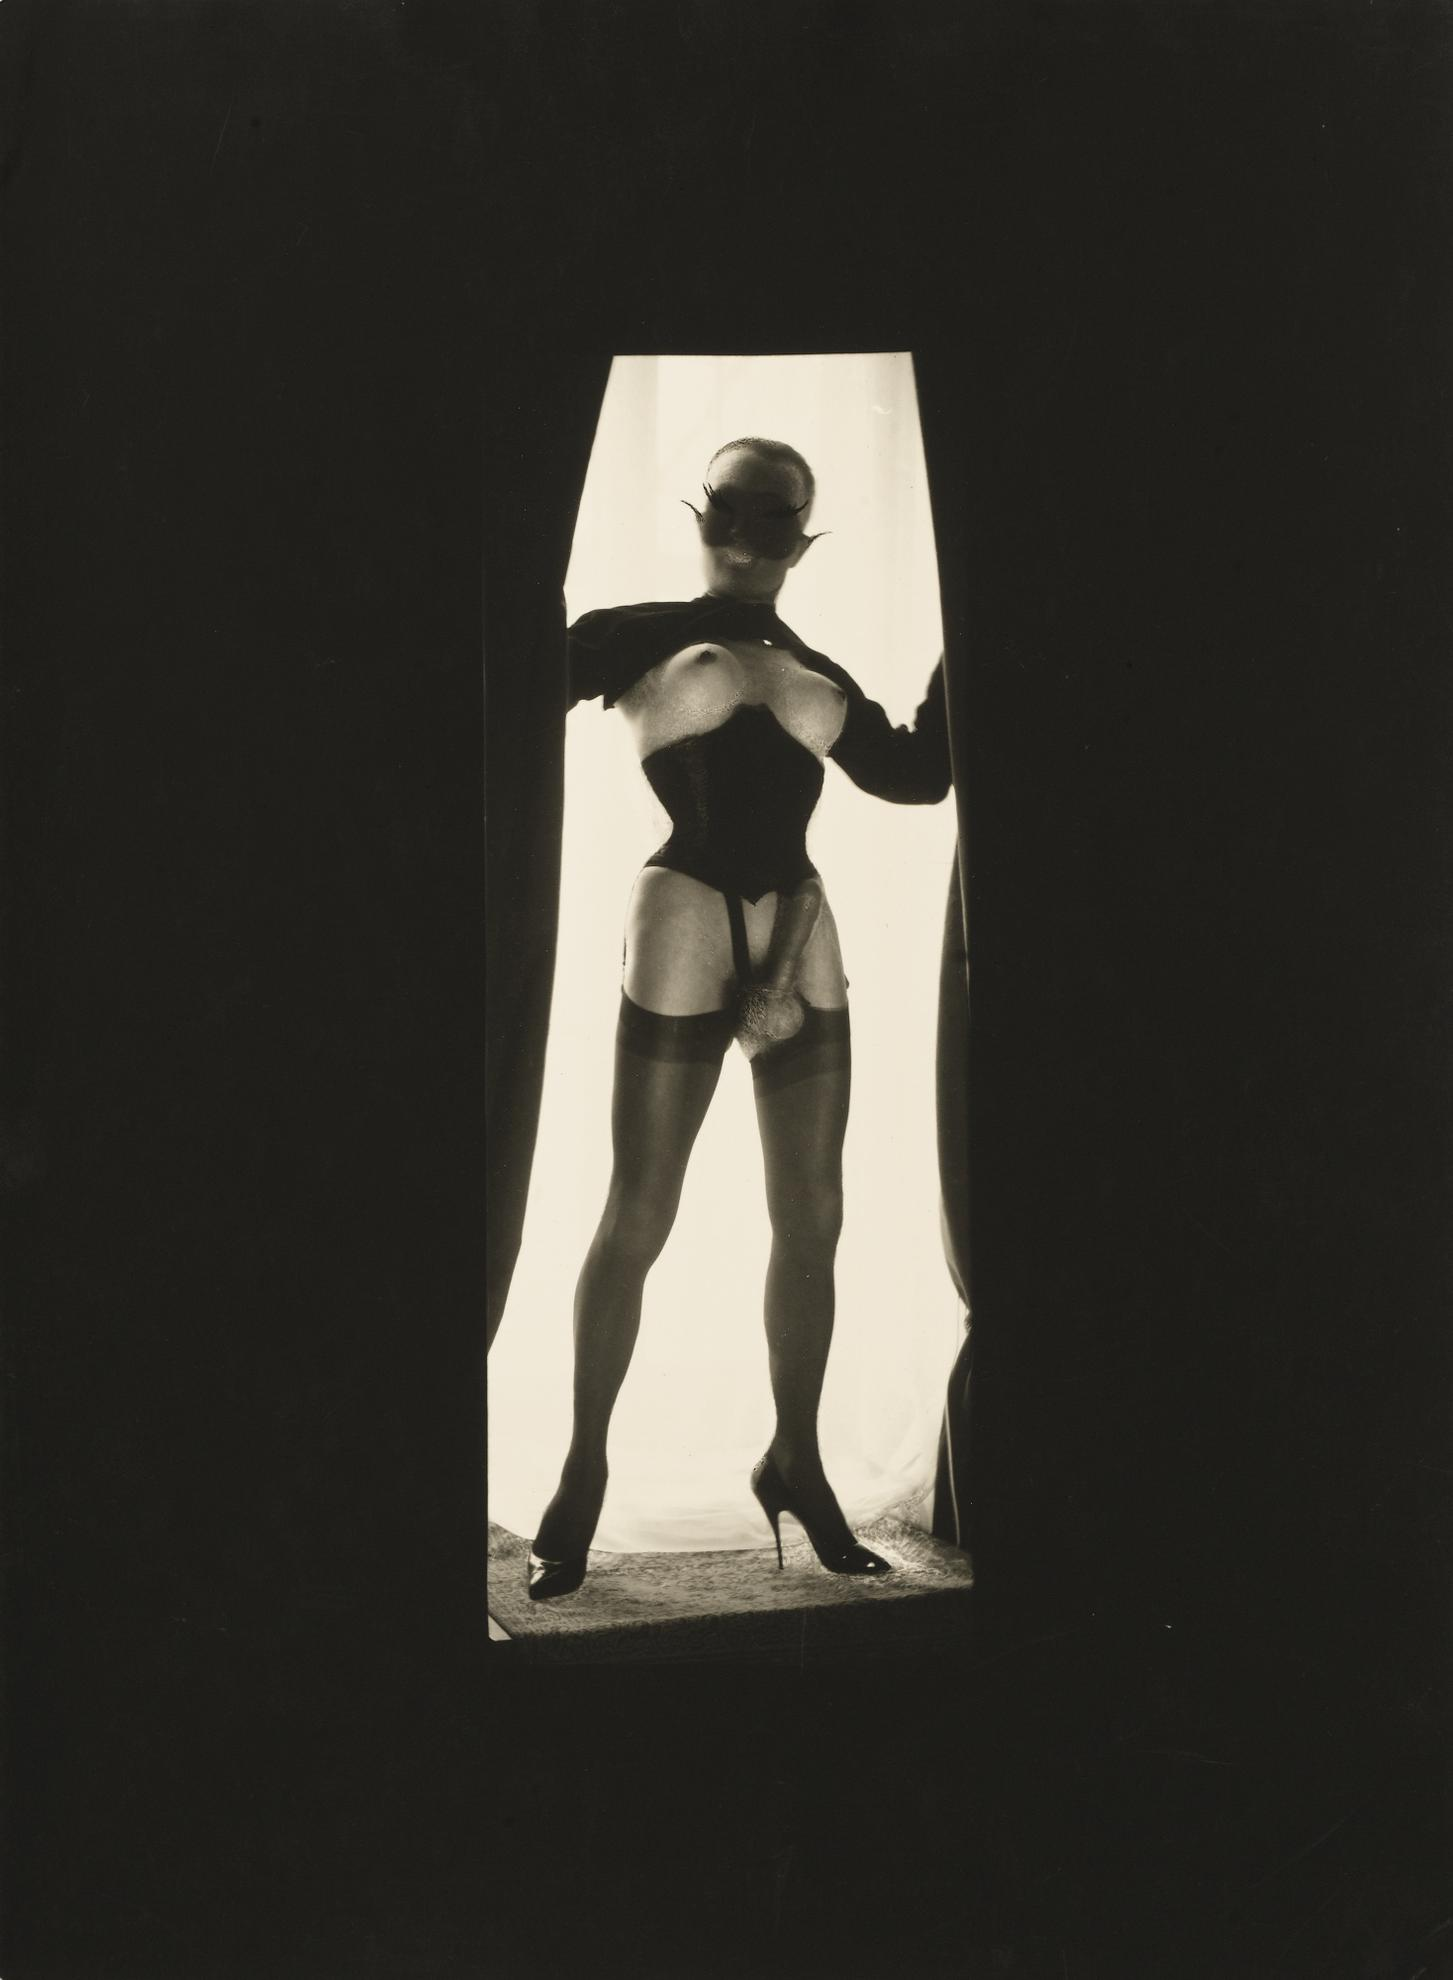 Pierre Molinier-Le Chaman-1965